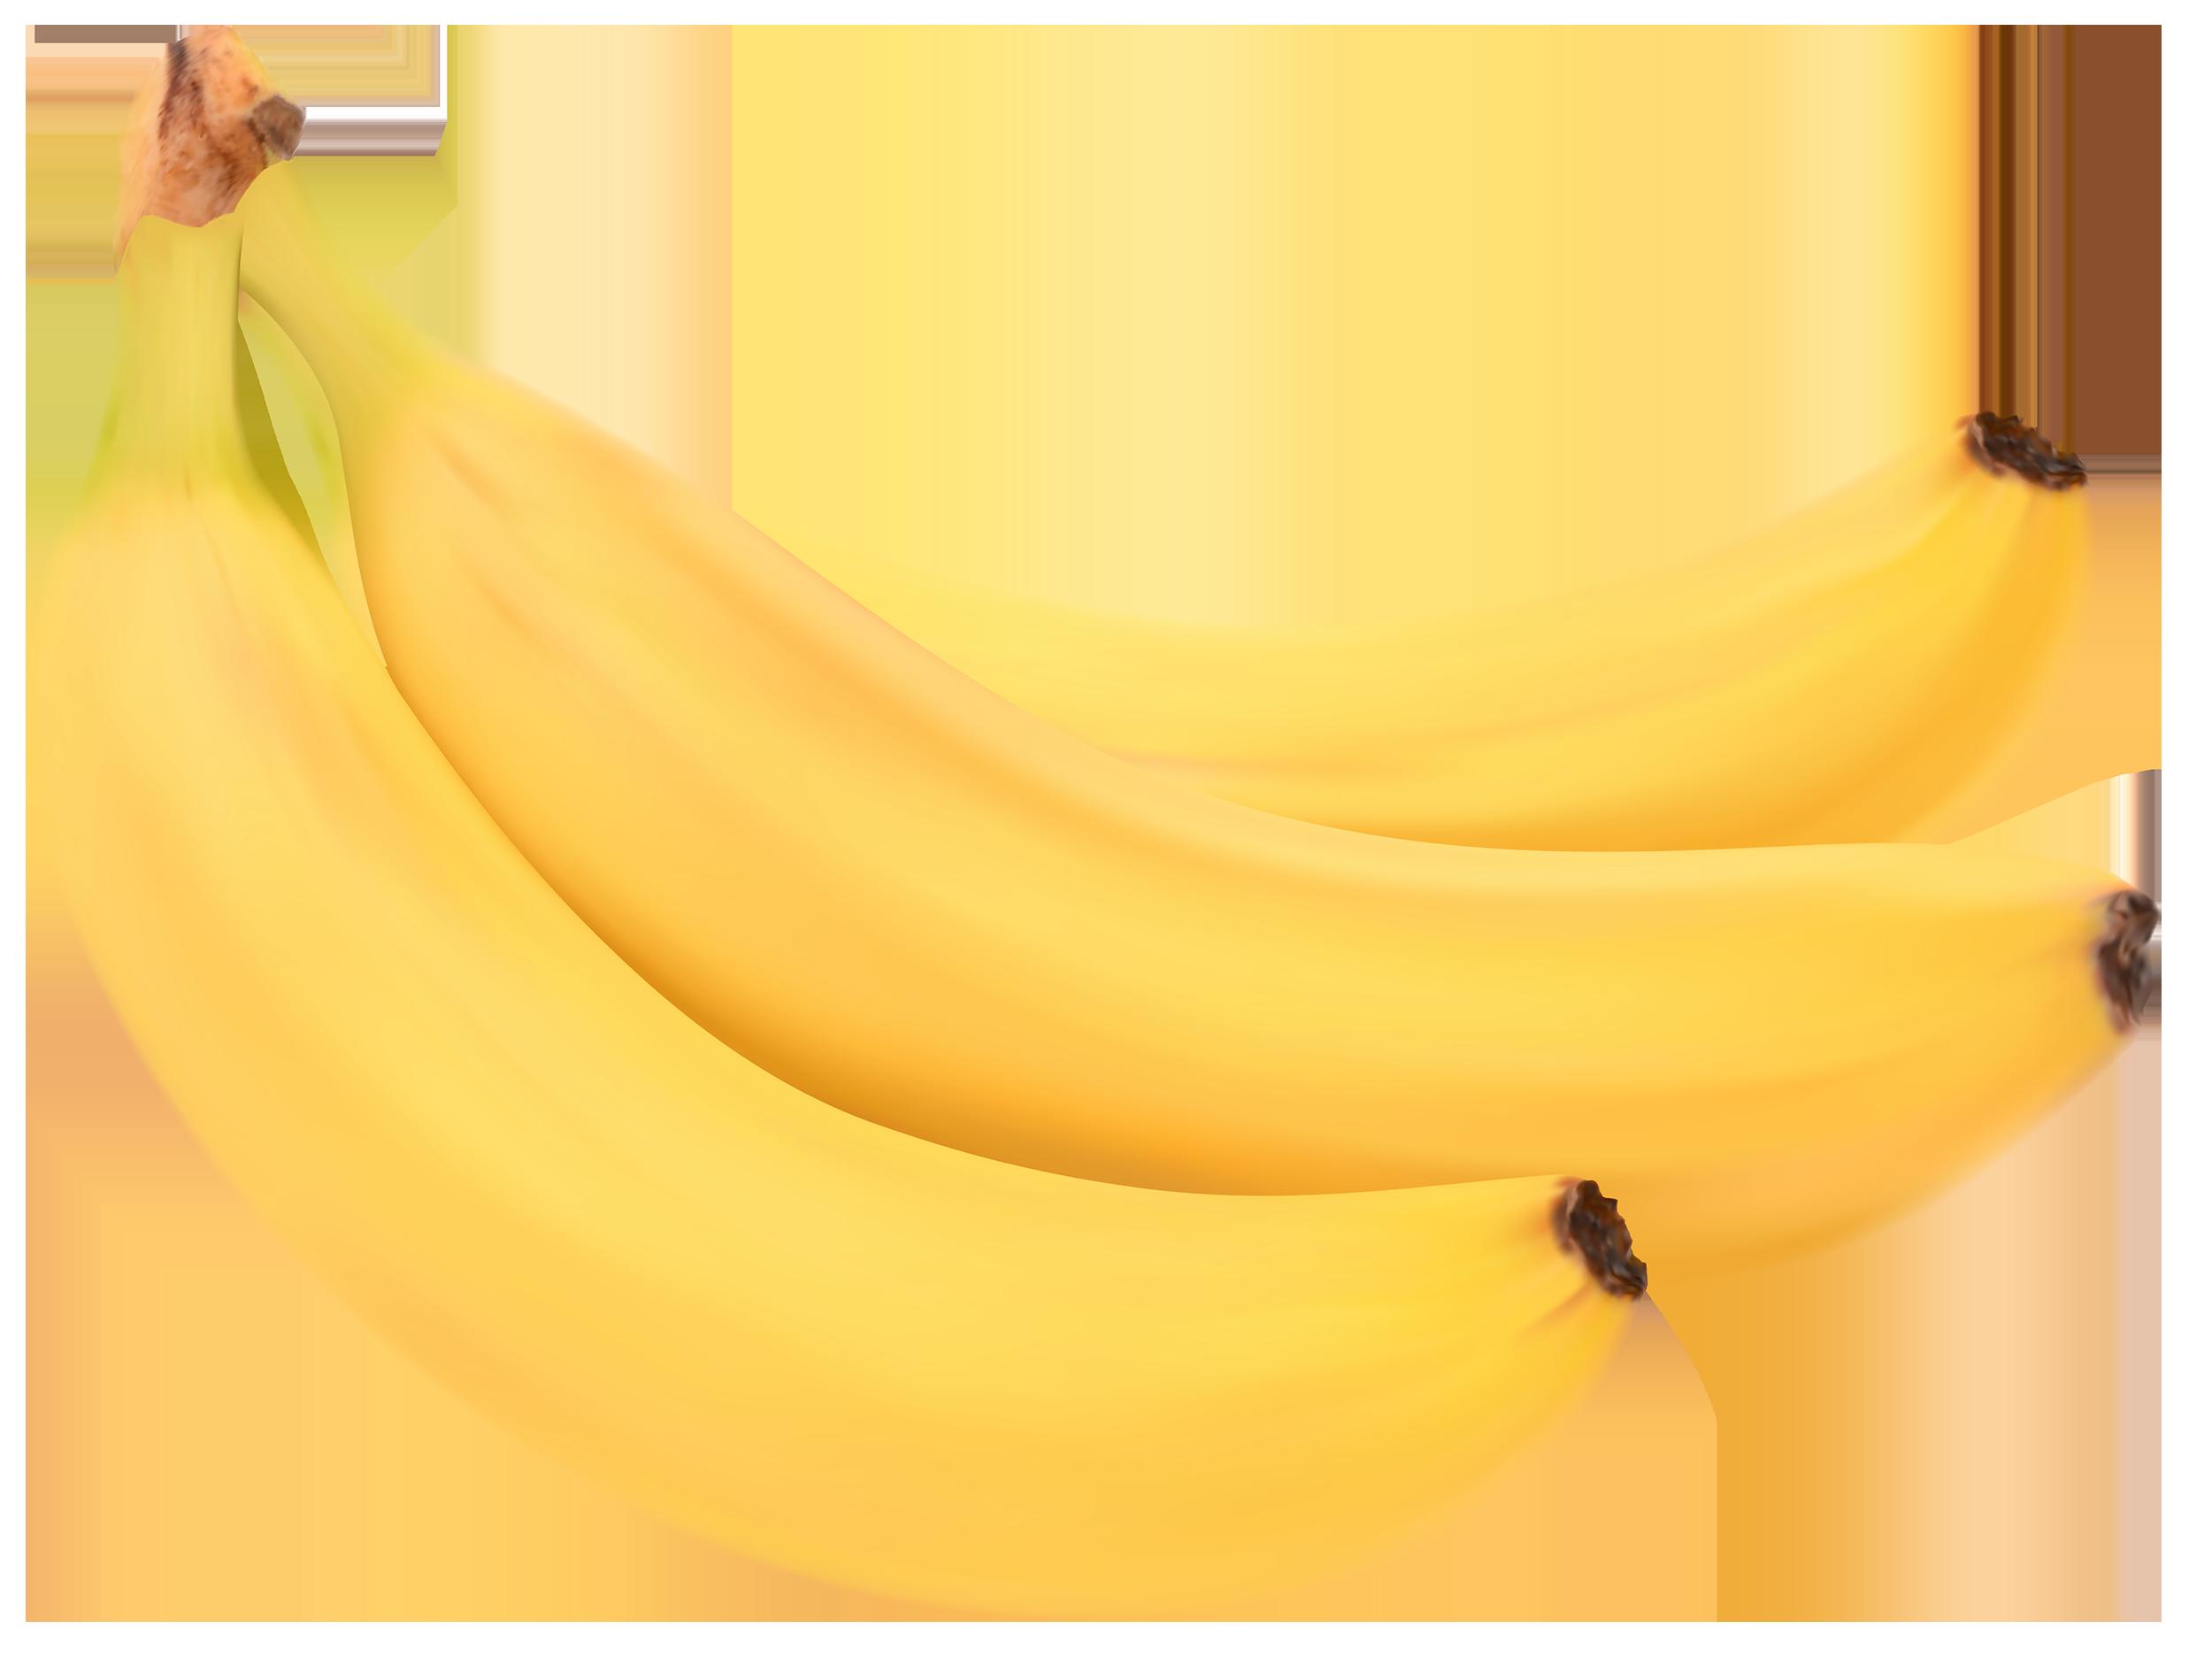 Bananas png best web. Orange clipart banana